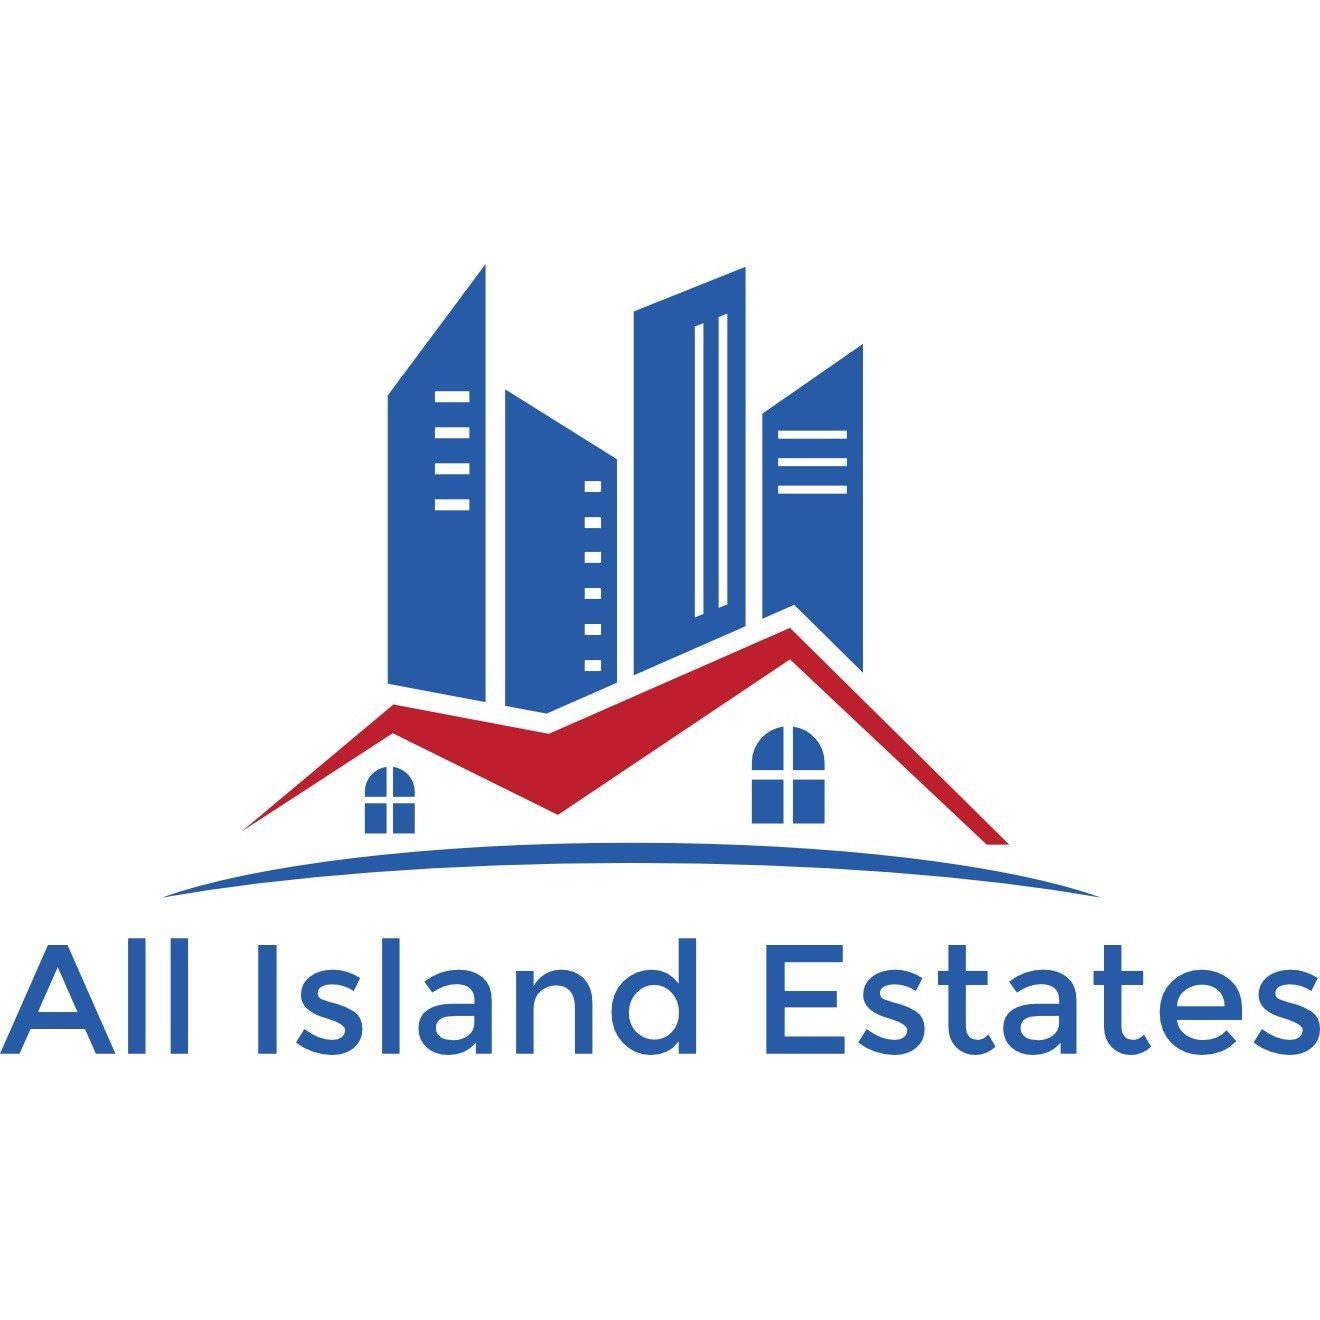 All Island Estates Realty Corp. Logo